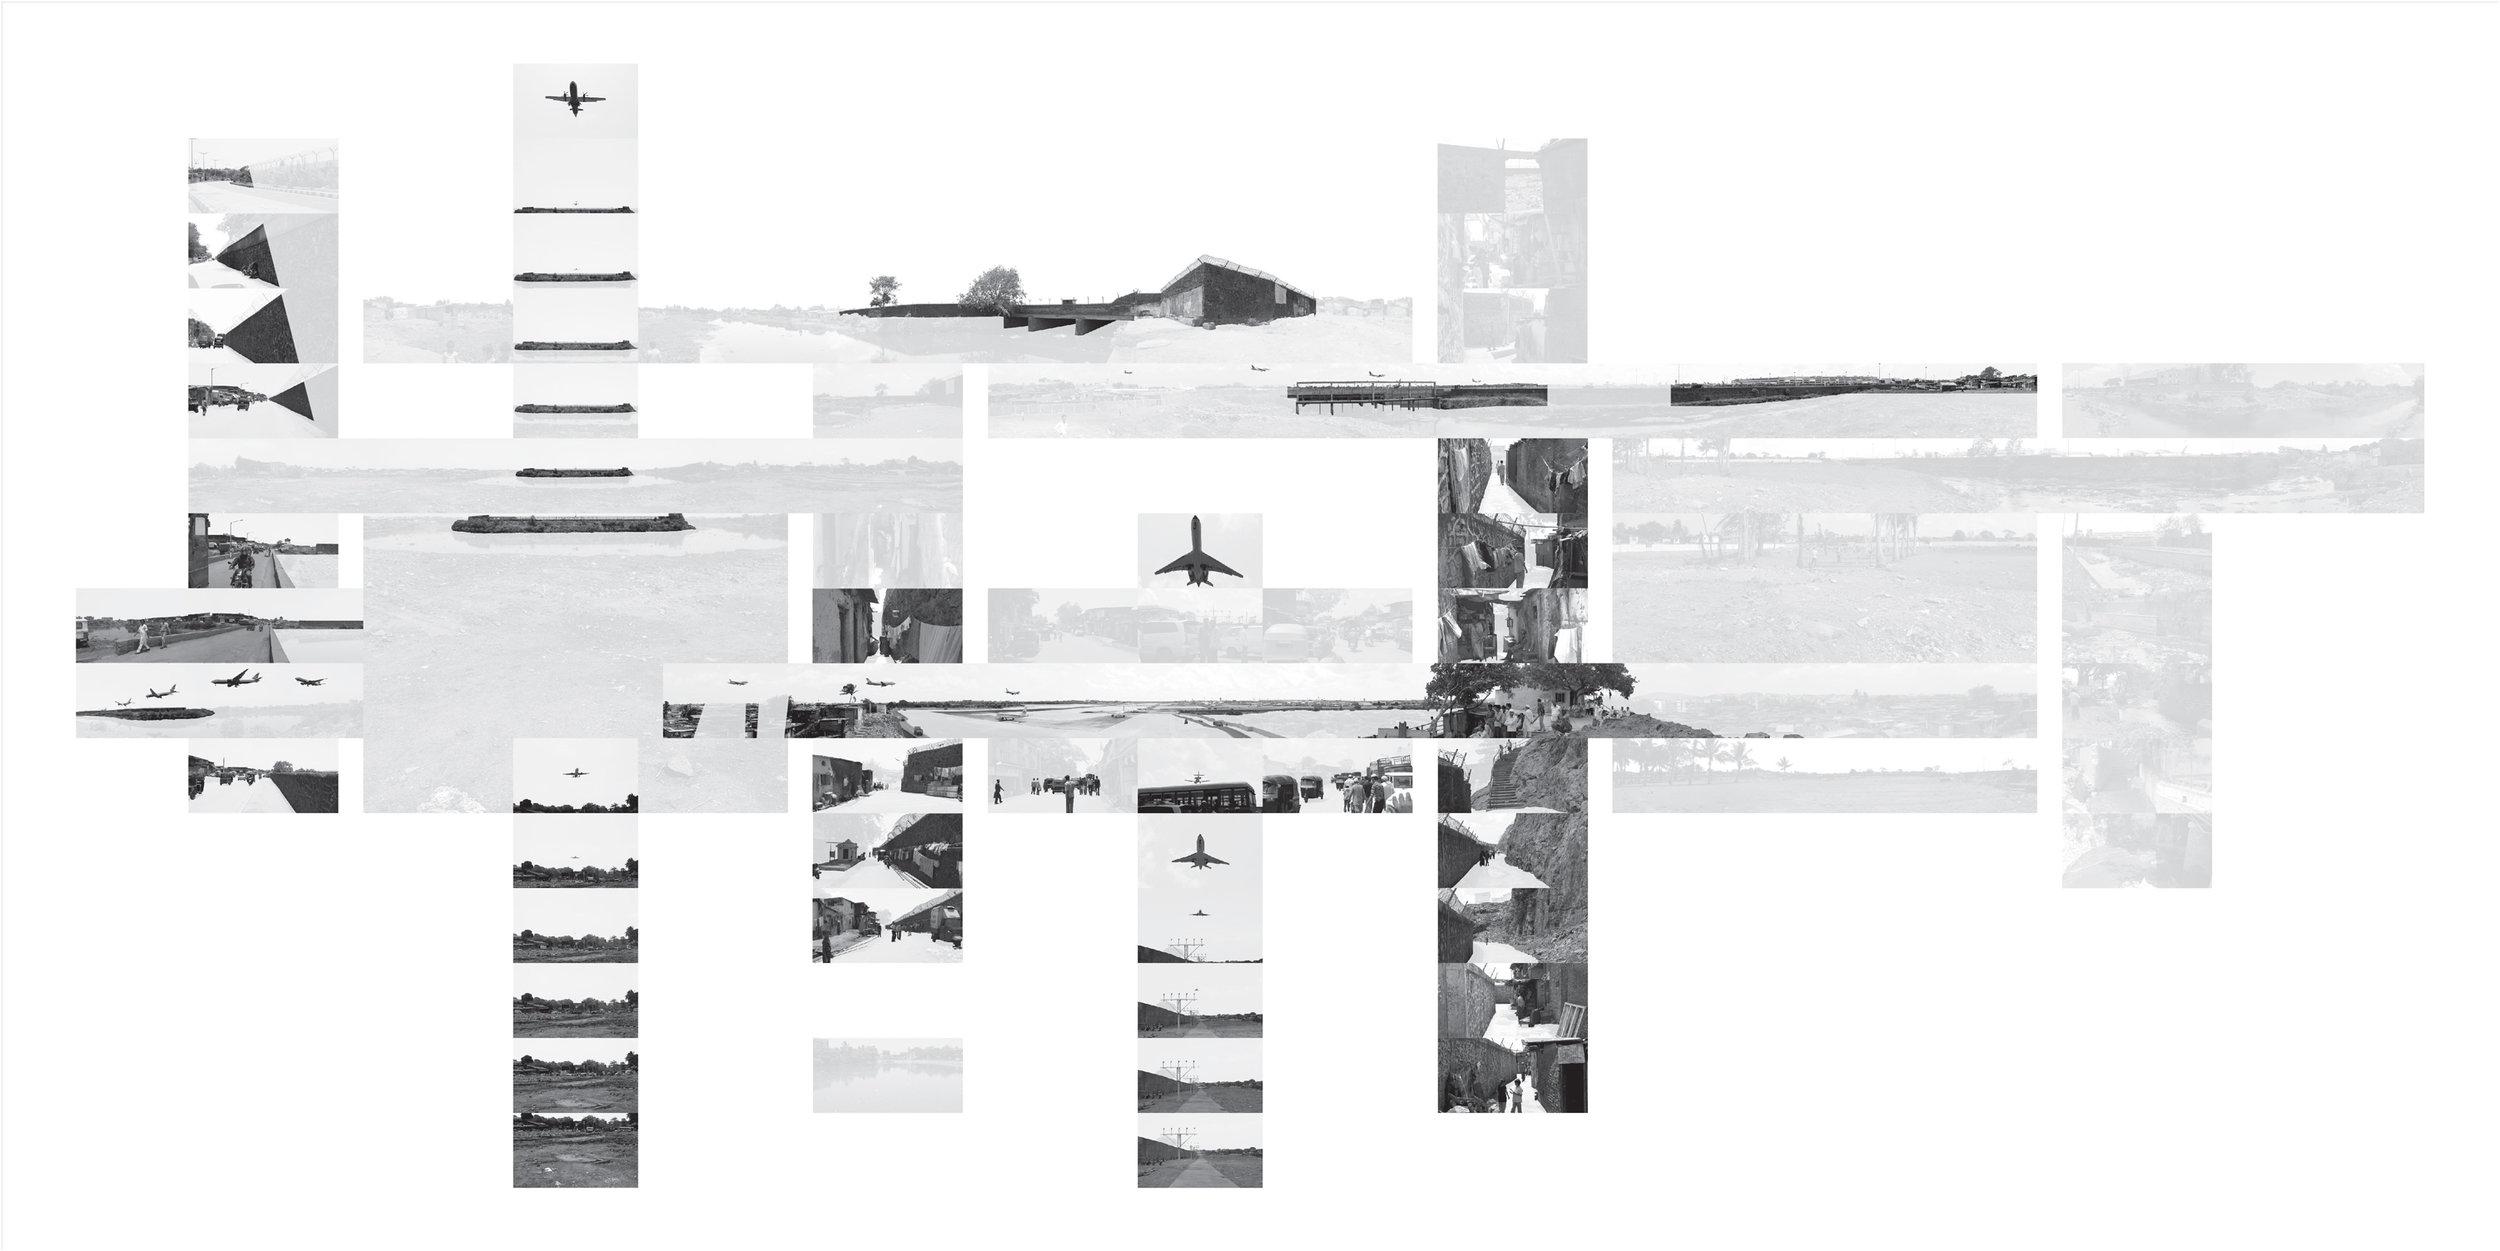 3_airport-crossing-diagram-photowork_1b.jpg